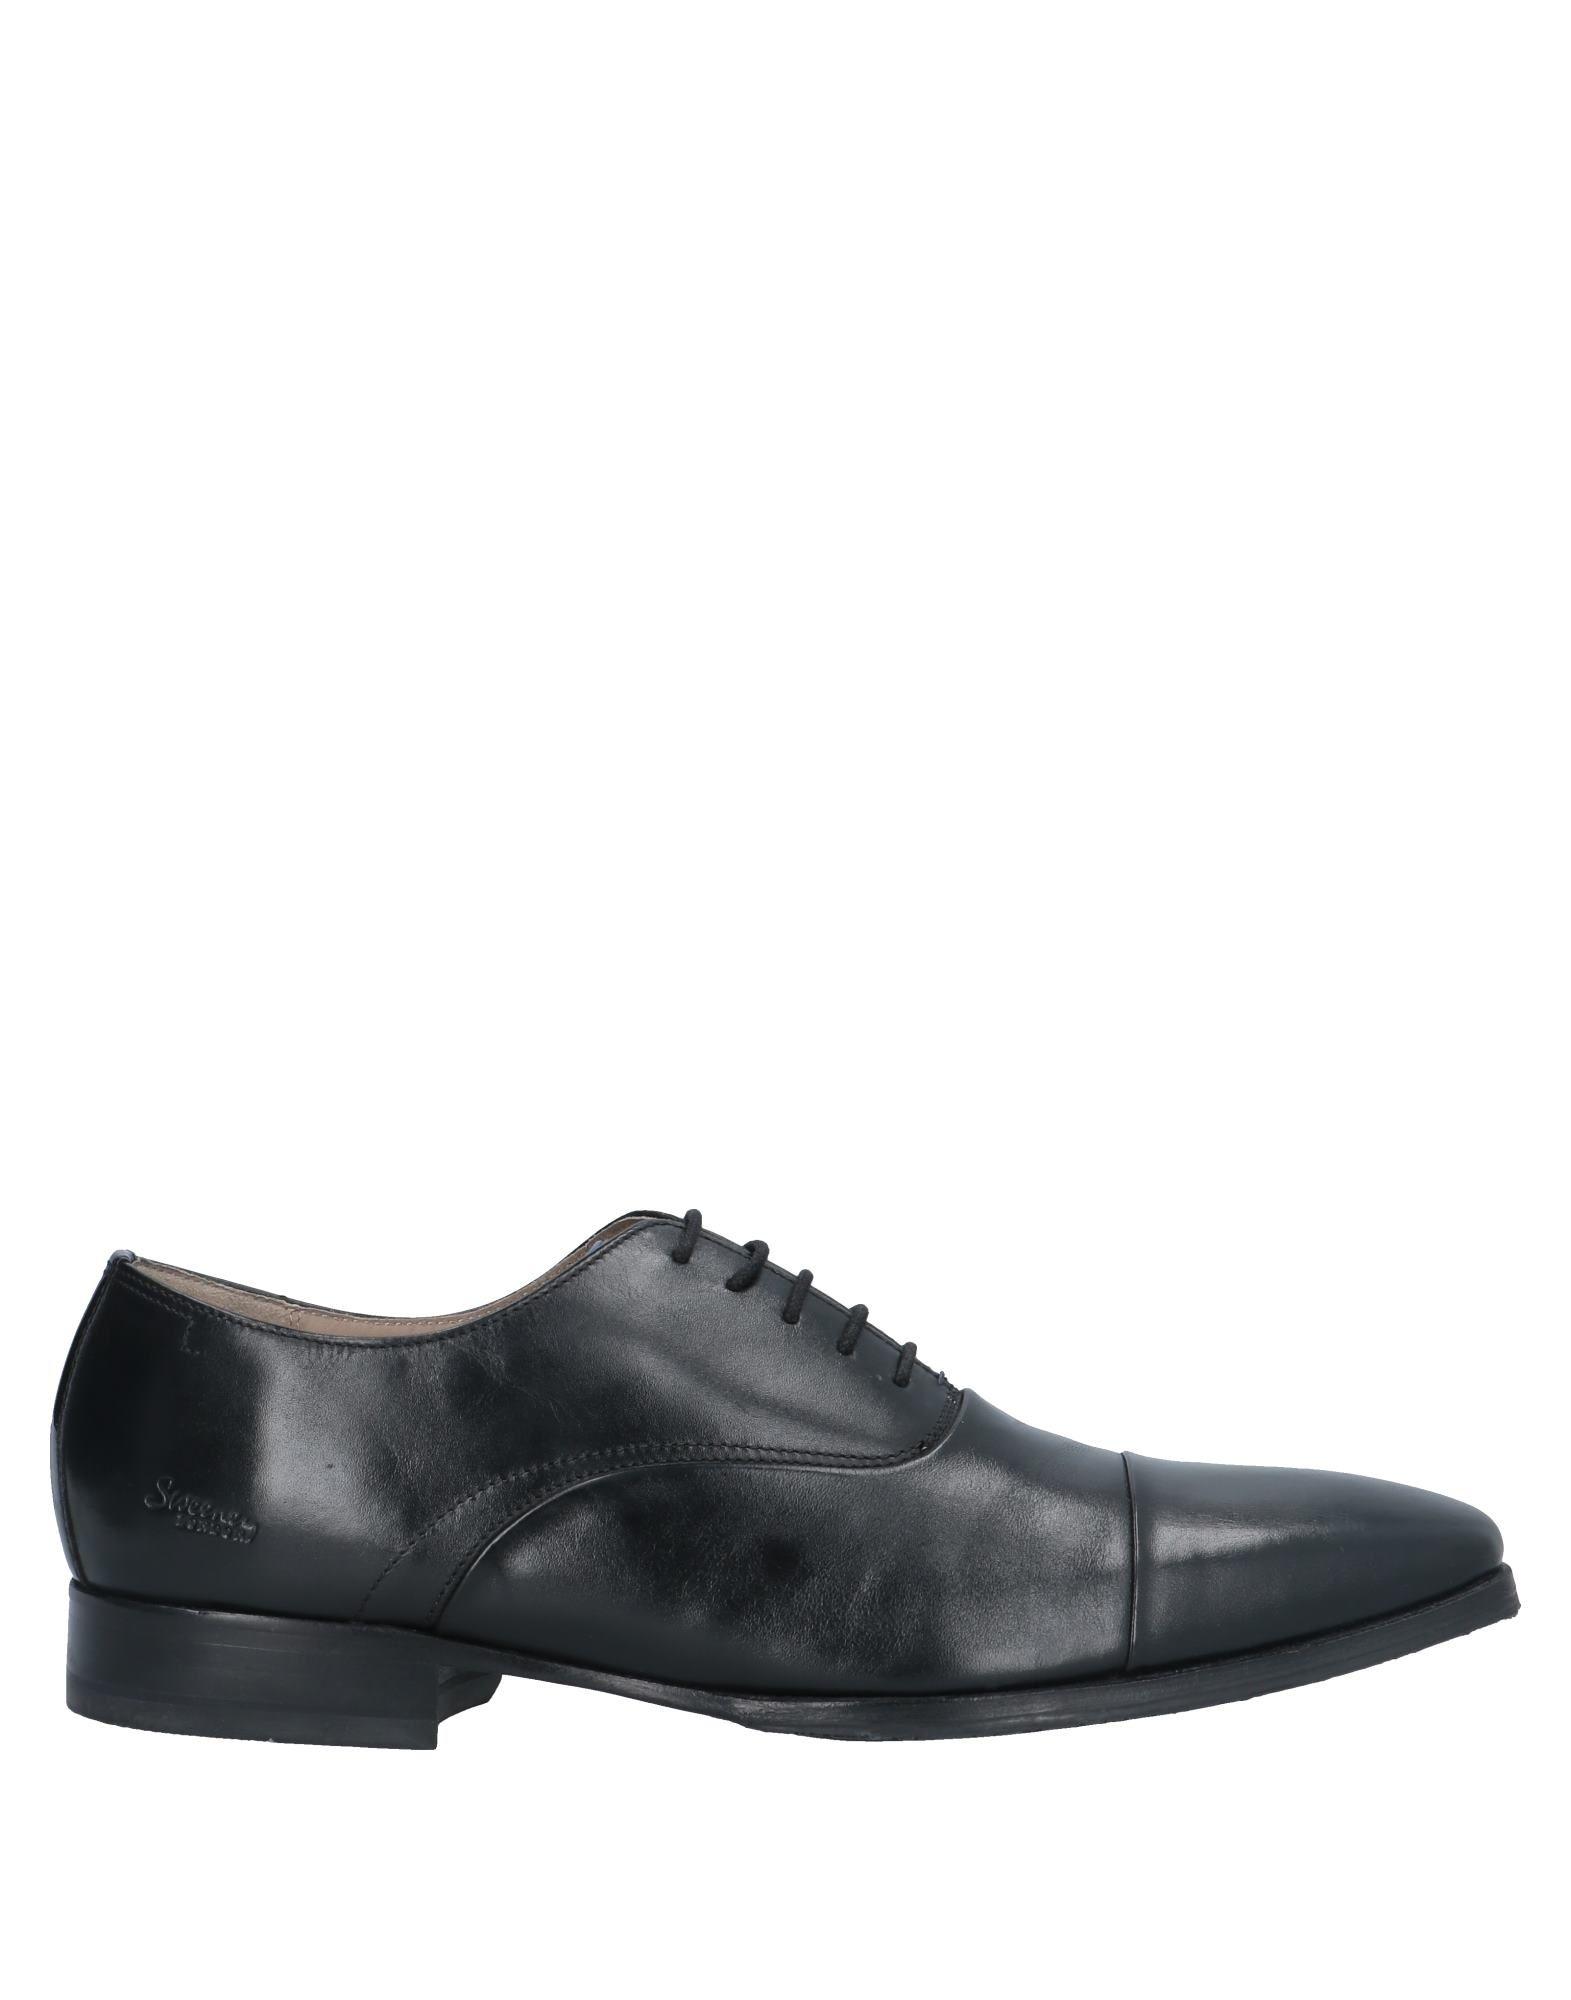 OLIVER SWEENEY Обувь на шнурках